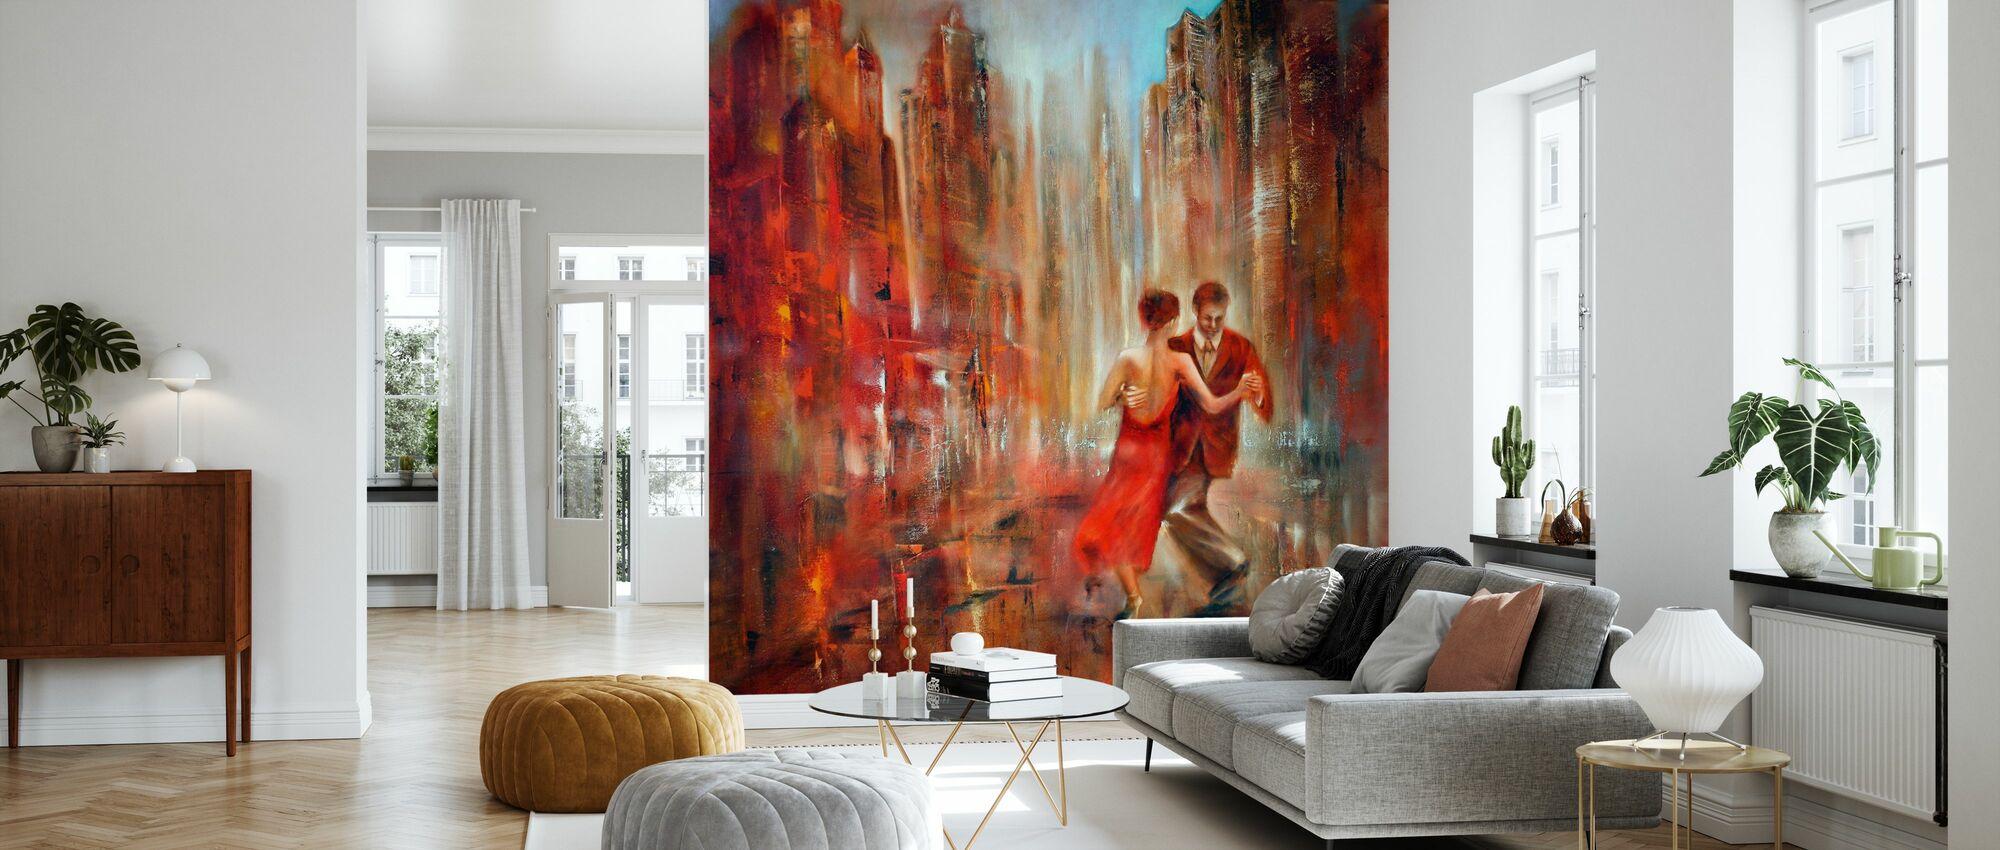 Tango - Wallpaper - Living Room